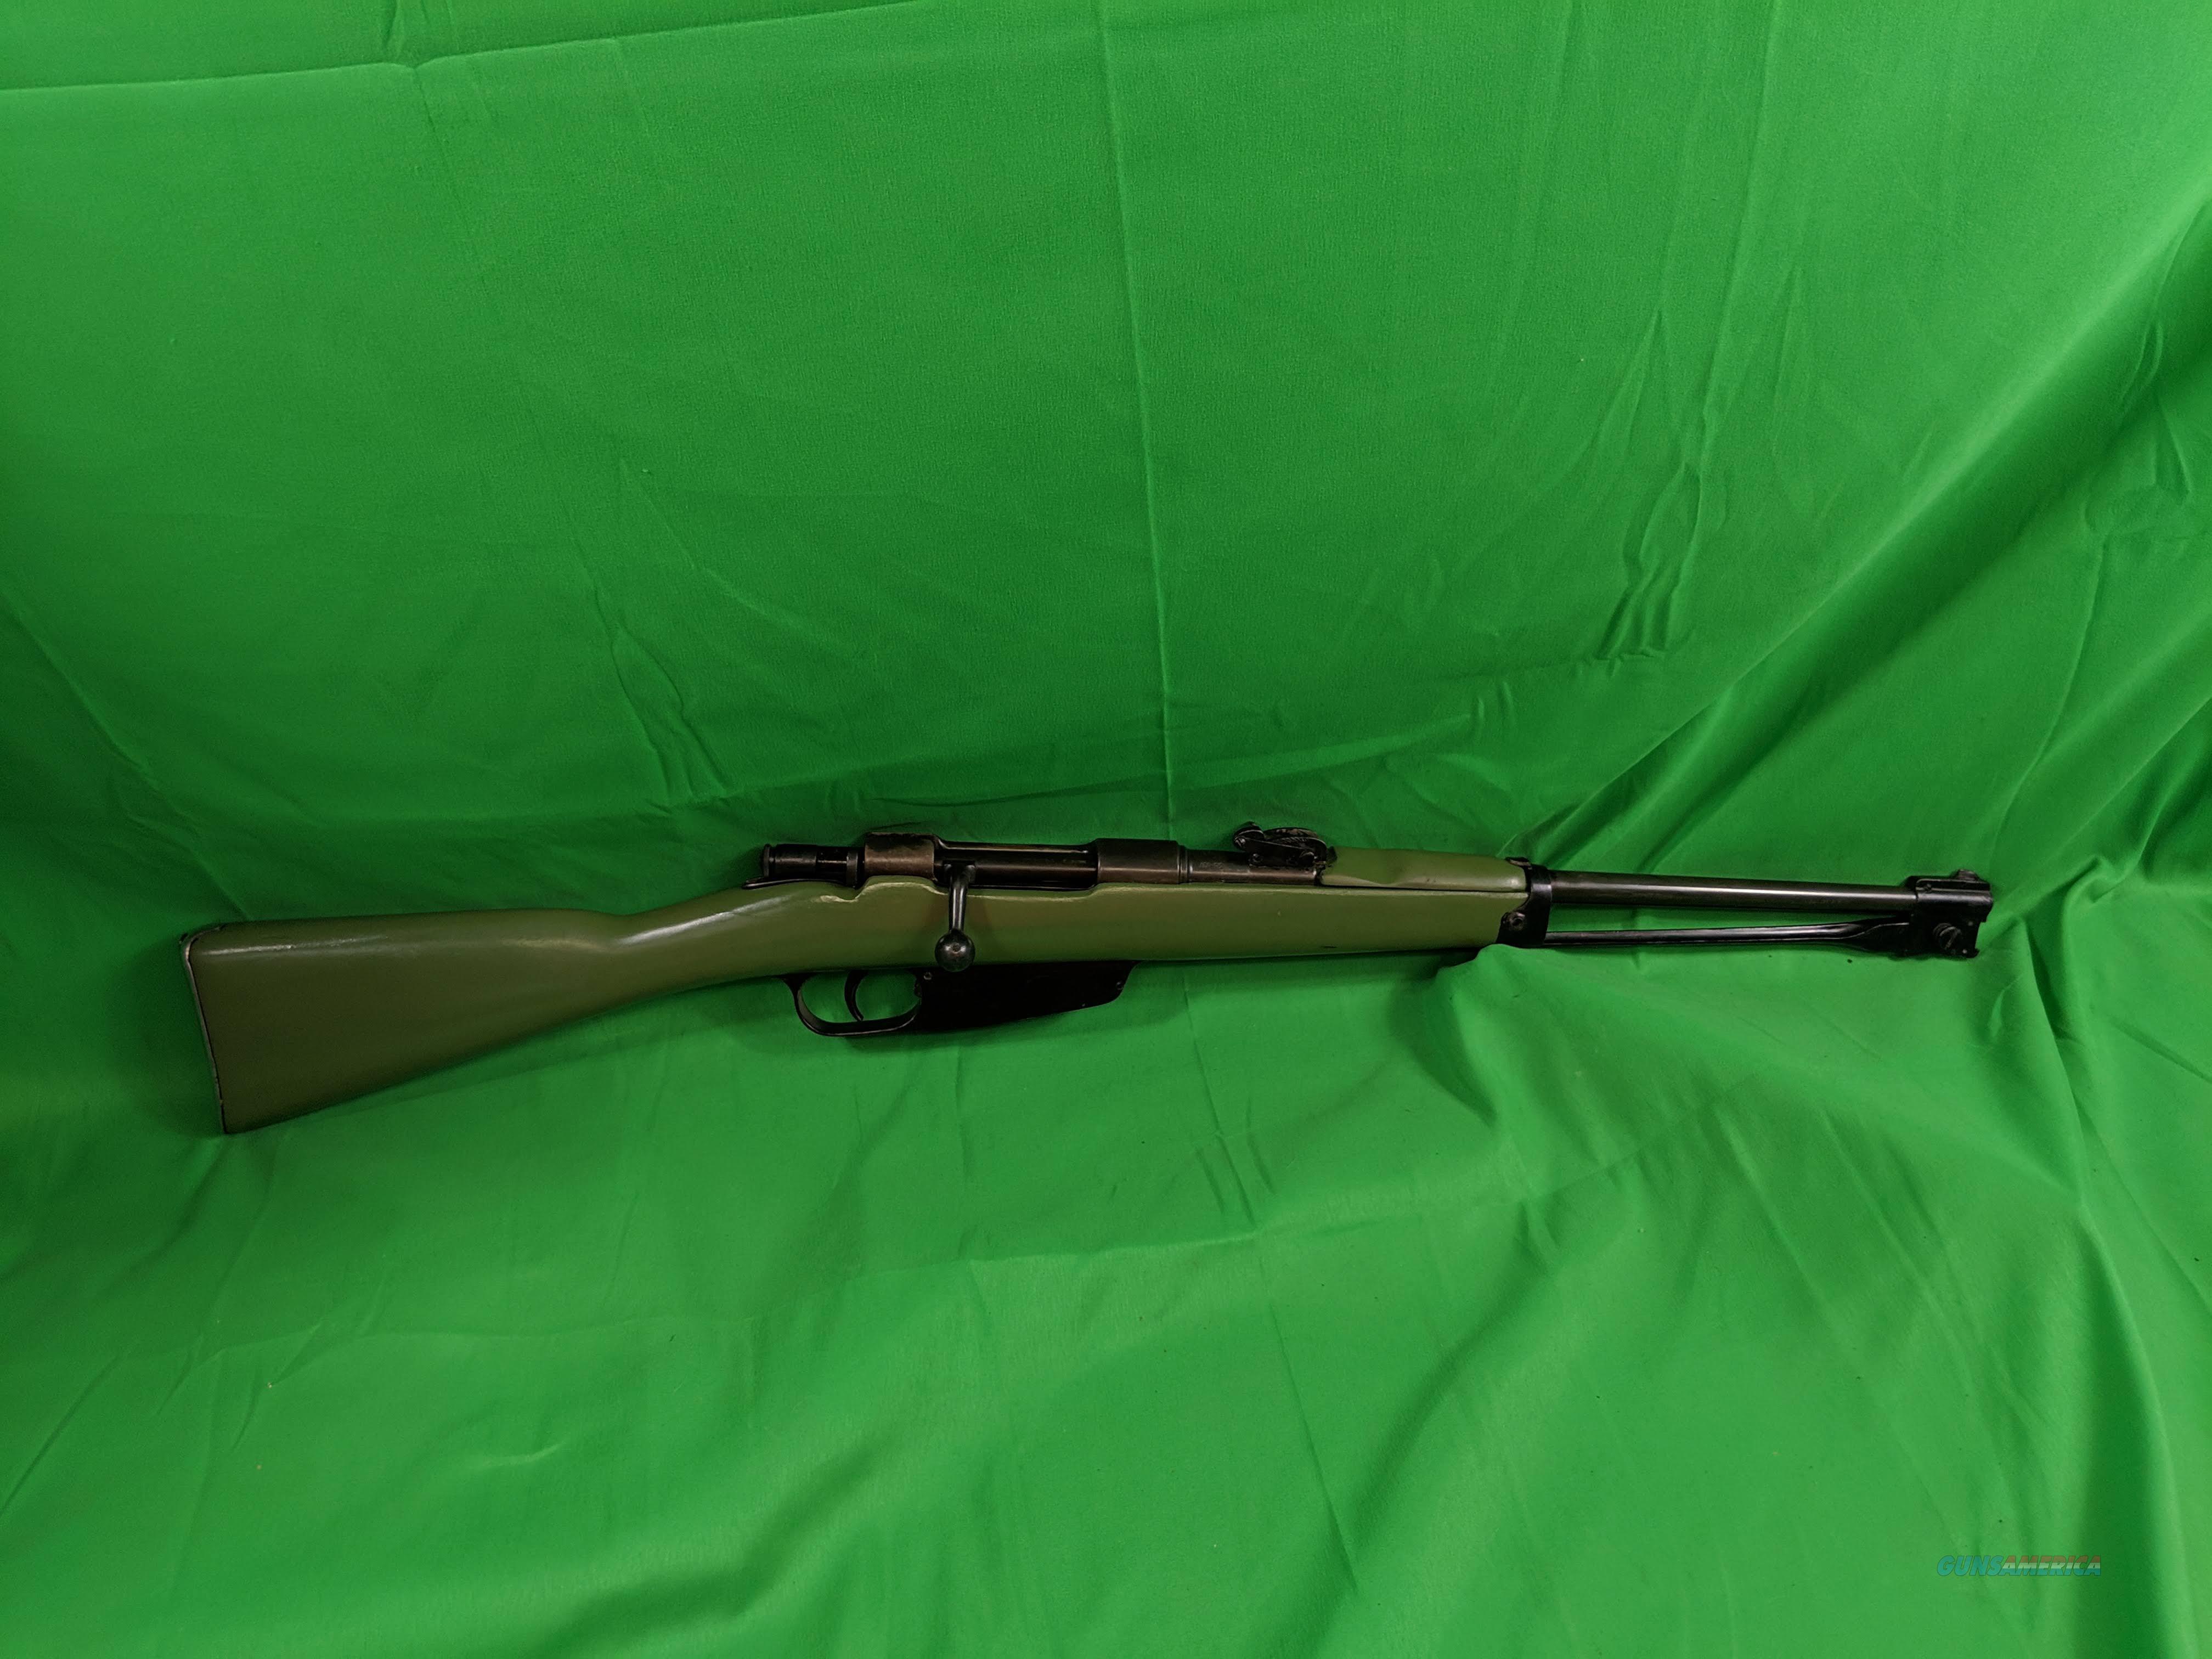 M1891 Carcano Cavalry Carbine 6 5